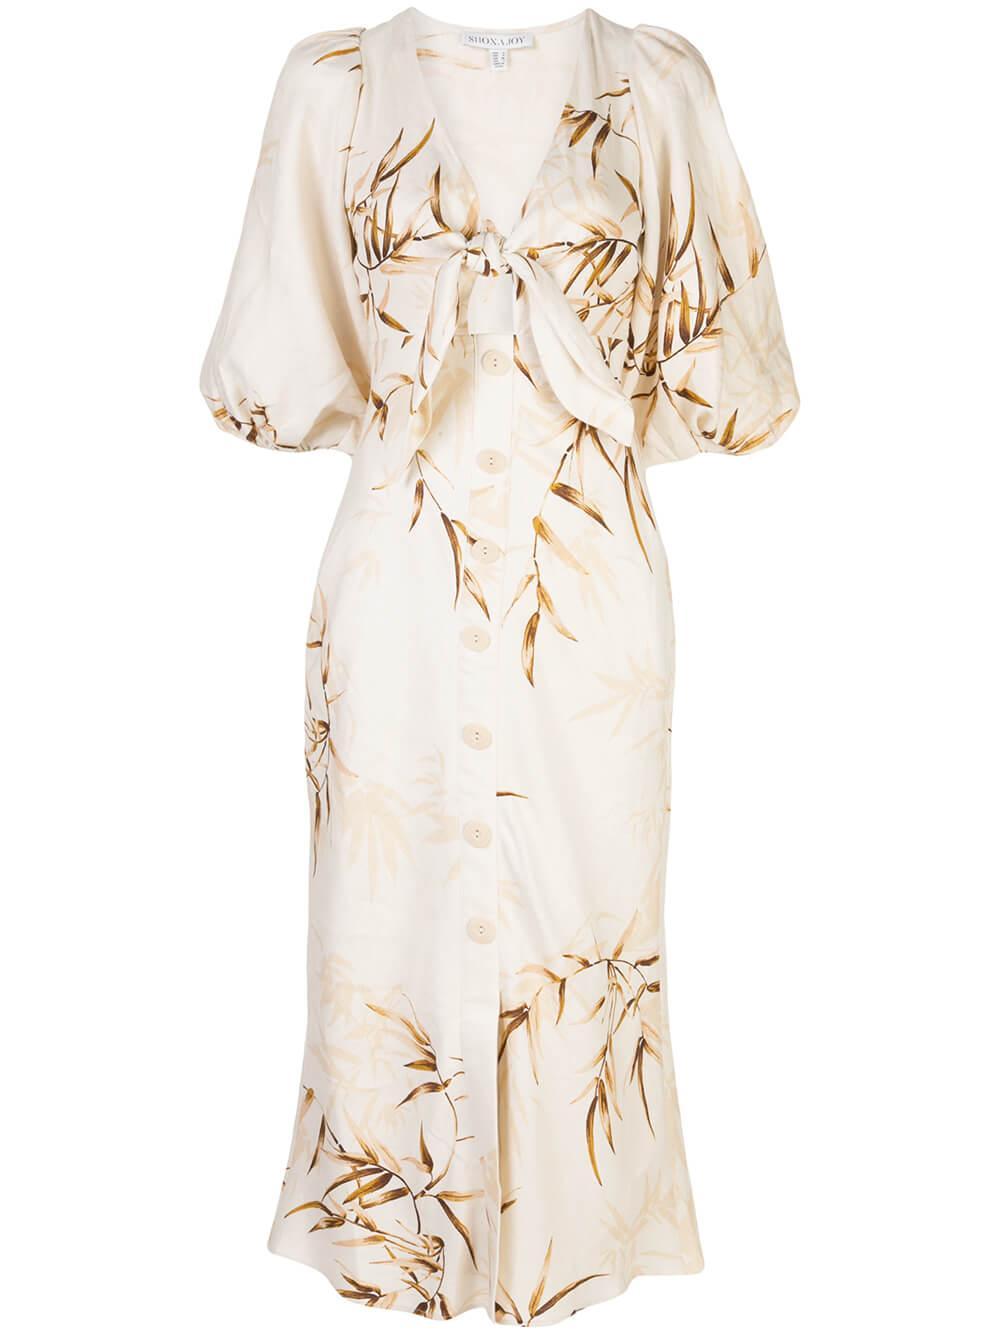 Sundance Tie Front Bias Midi Dress